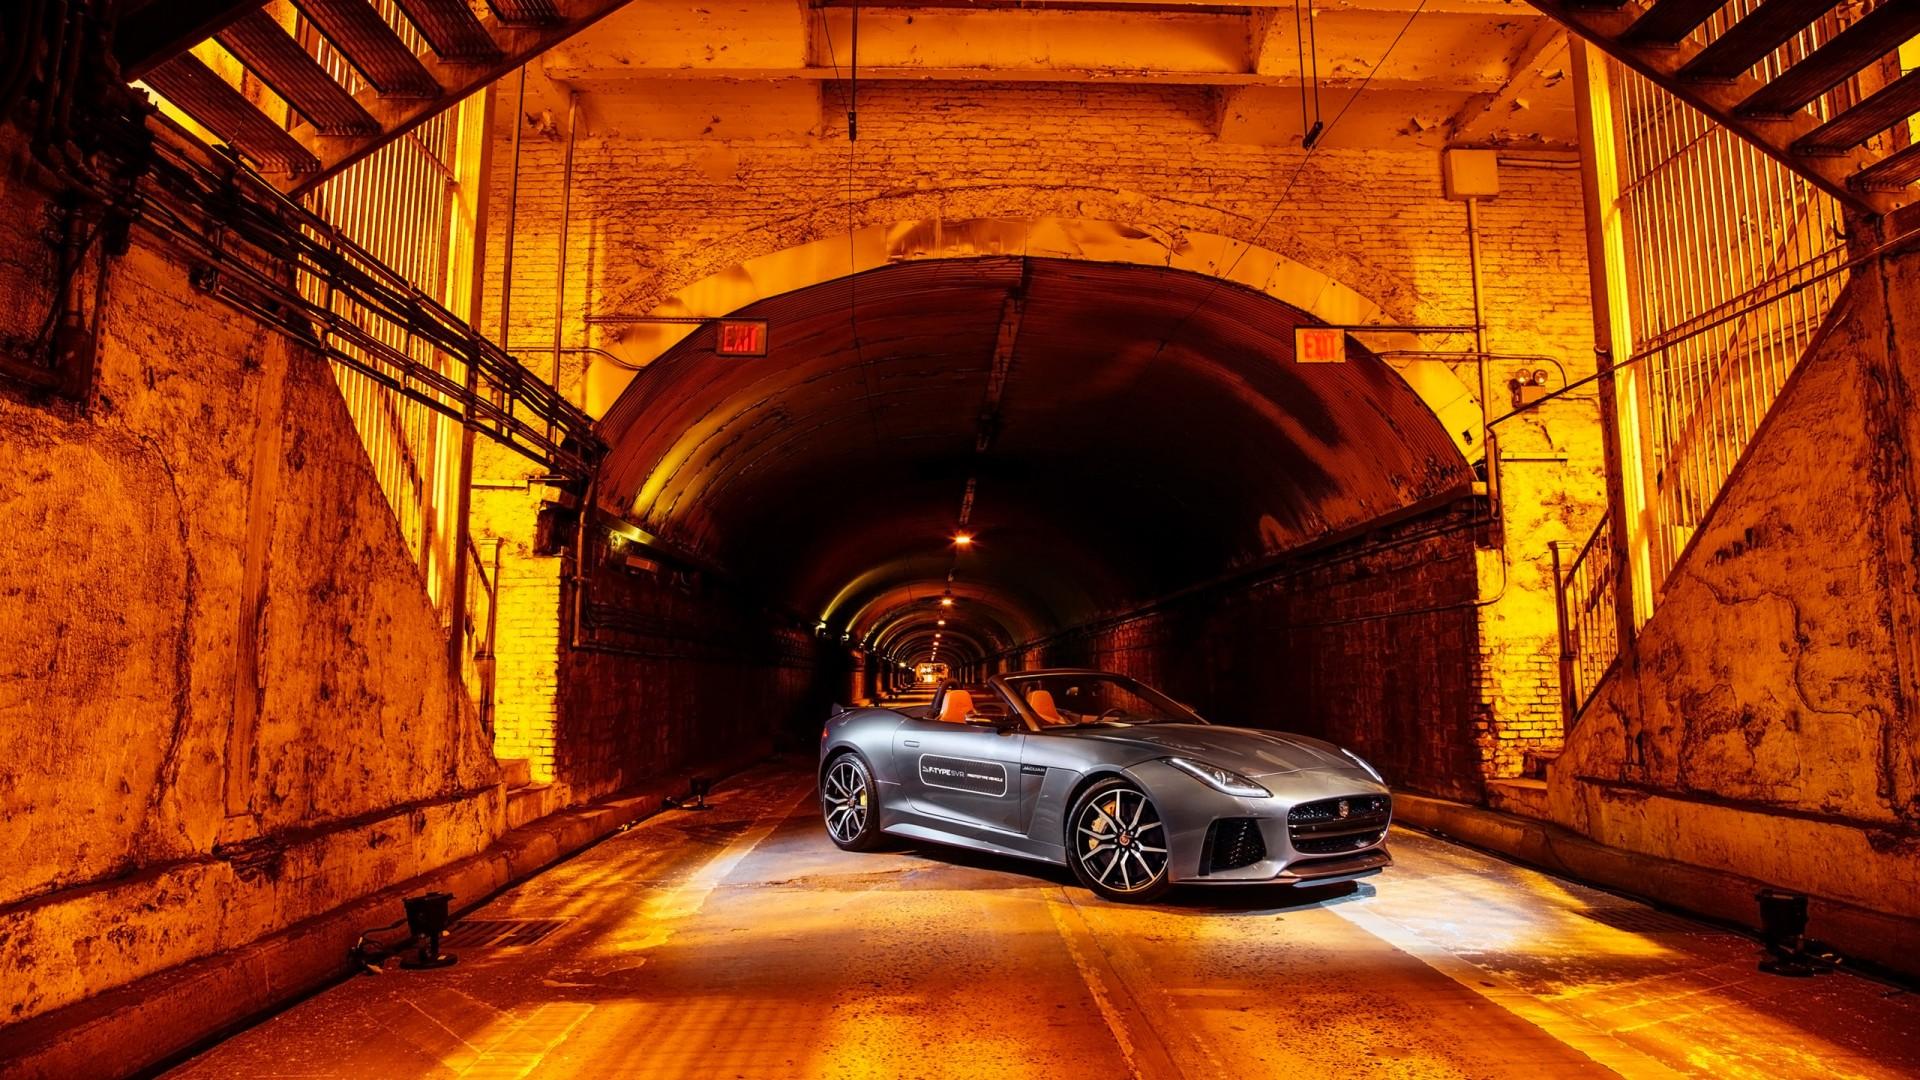 Jaguar Car Wallpapers Hd Free Download 2016 Jaguar F Type Svr Park Avenue Tunnel Wallpaper Hd